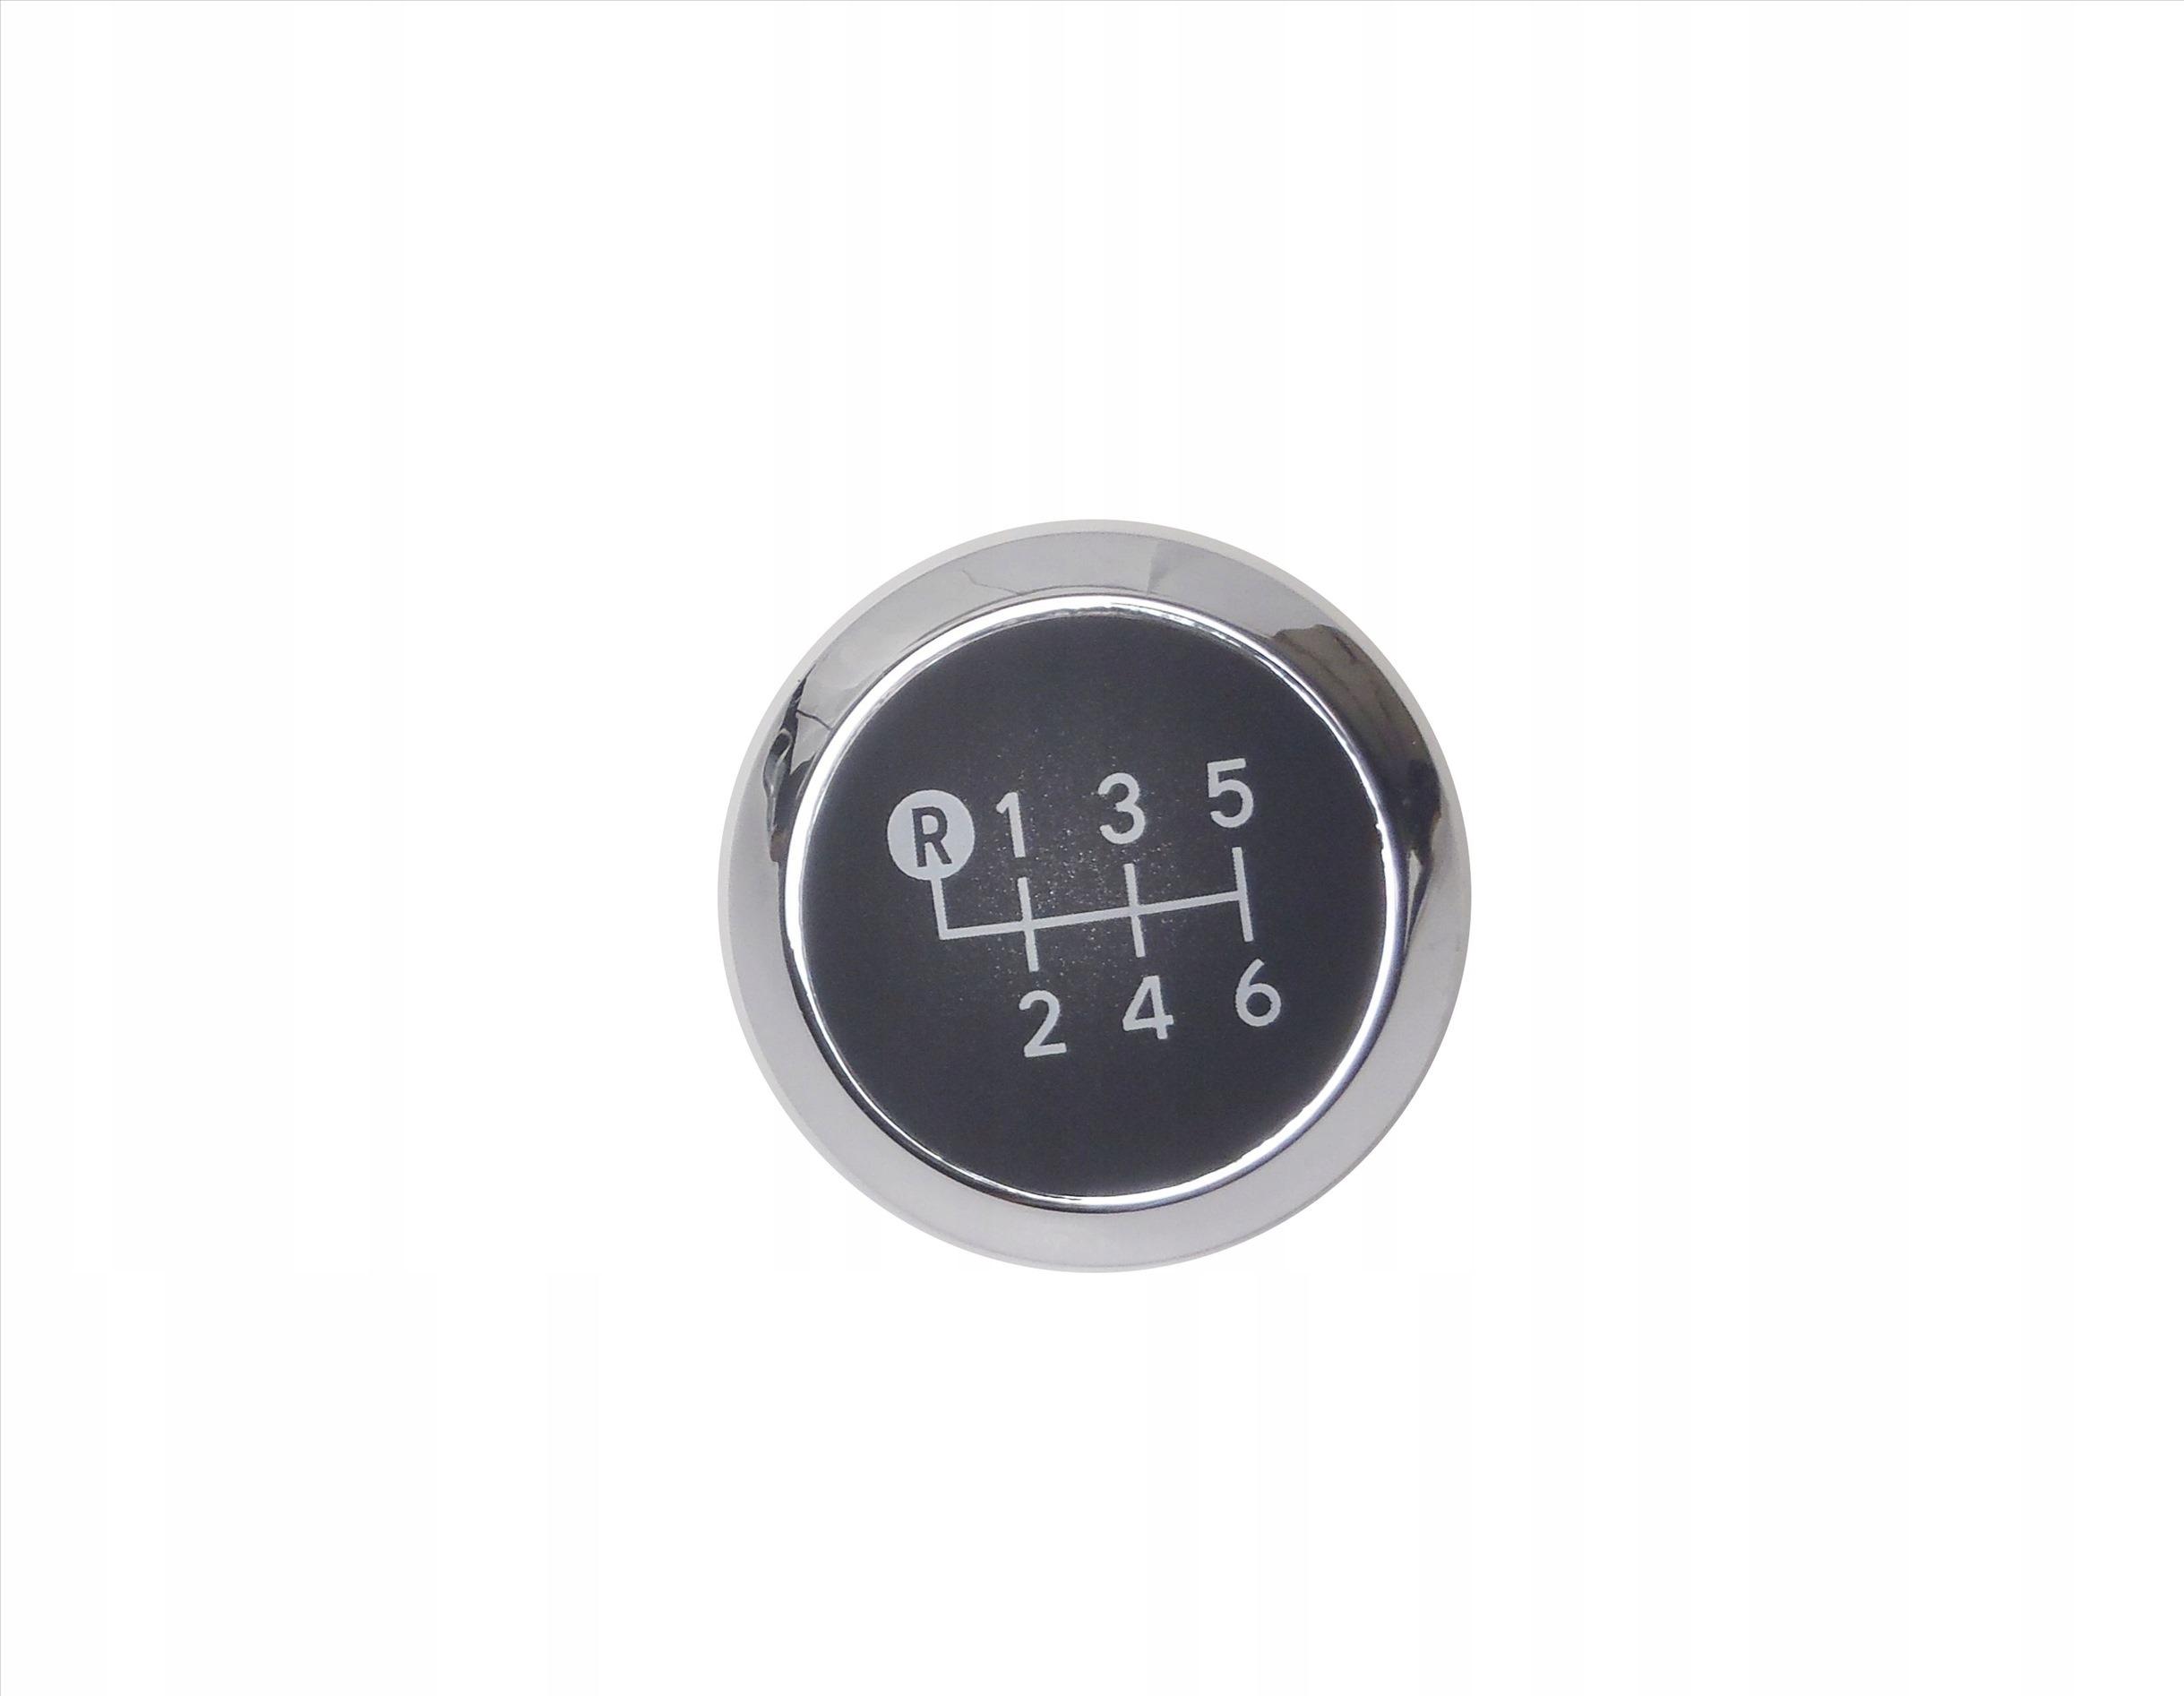 avensis t27 08-15 заглушка ручка изменения передач